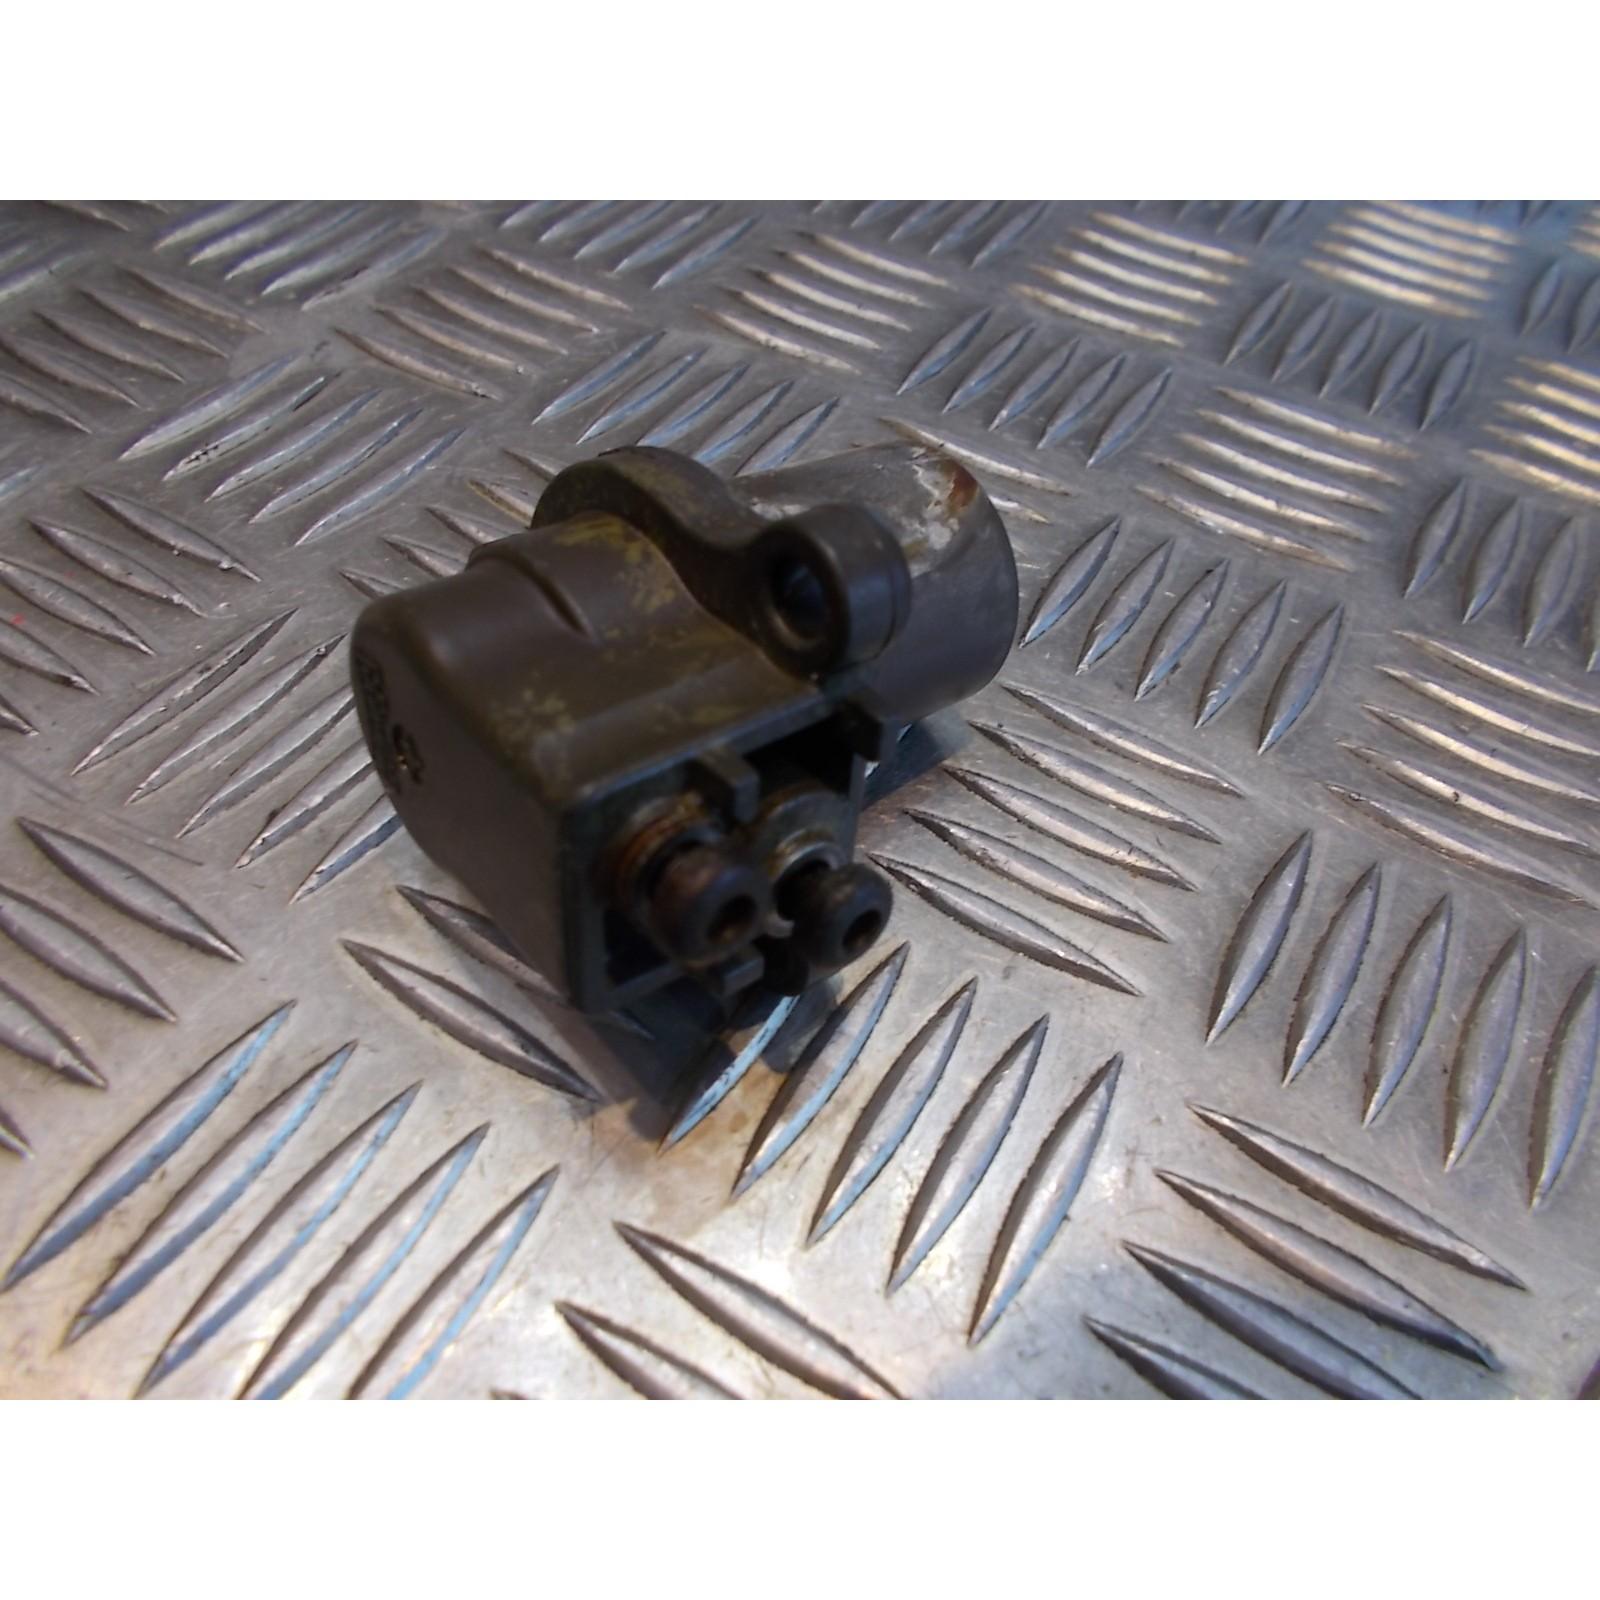 recepteur cylindre commande embrayage moto bmw k 1200 lt wb10545a 1999 - 03